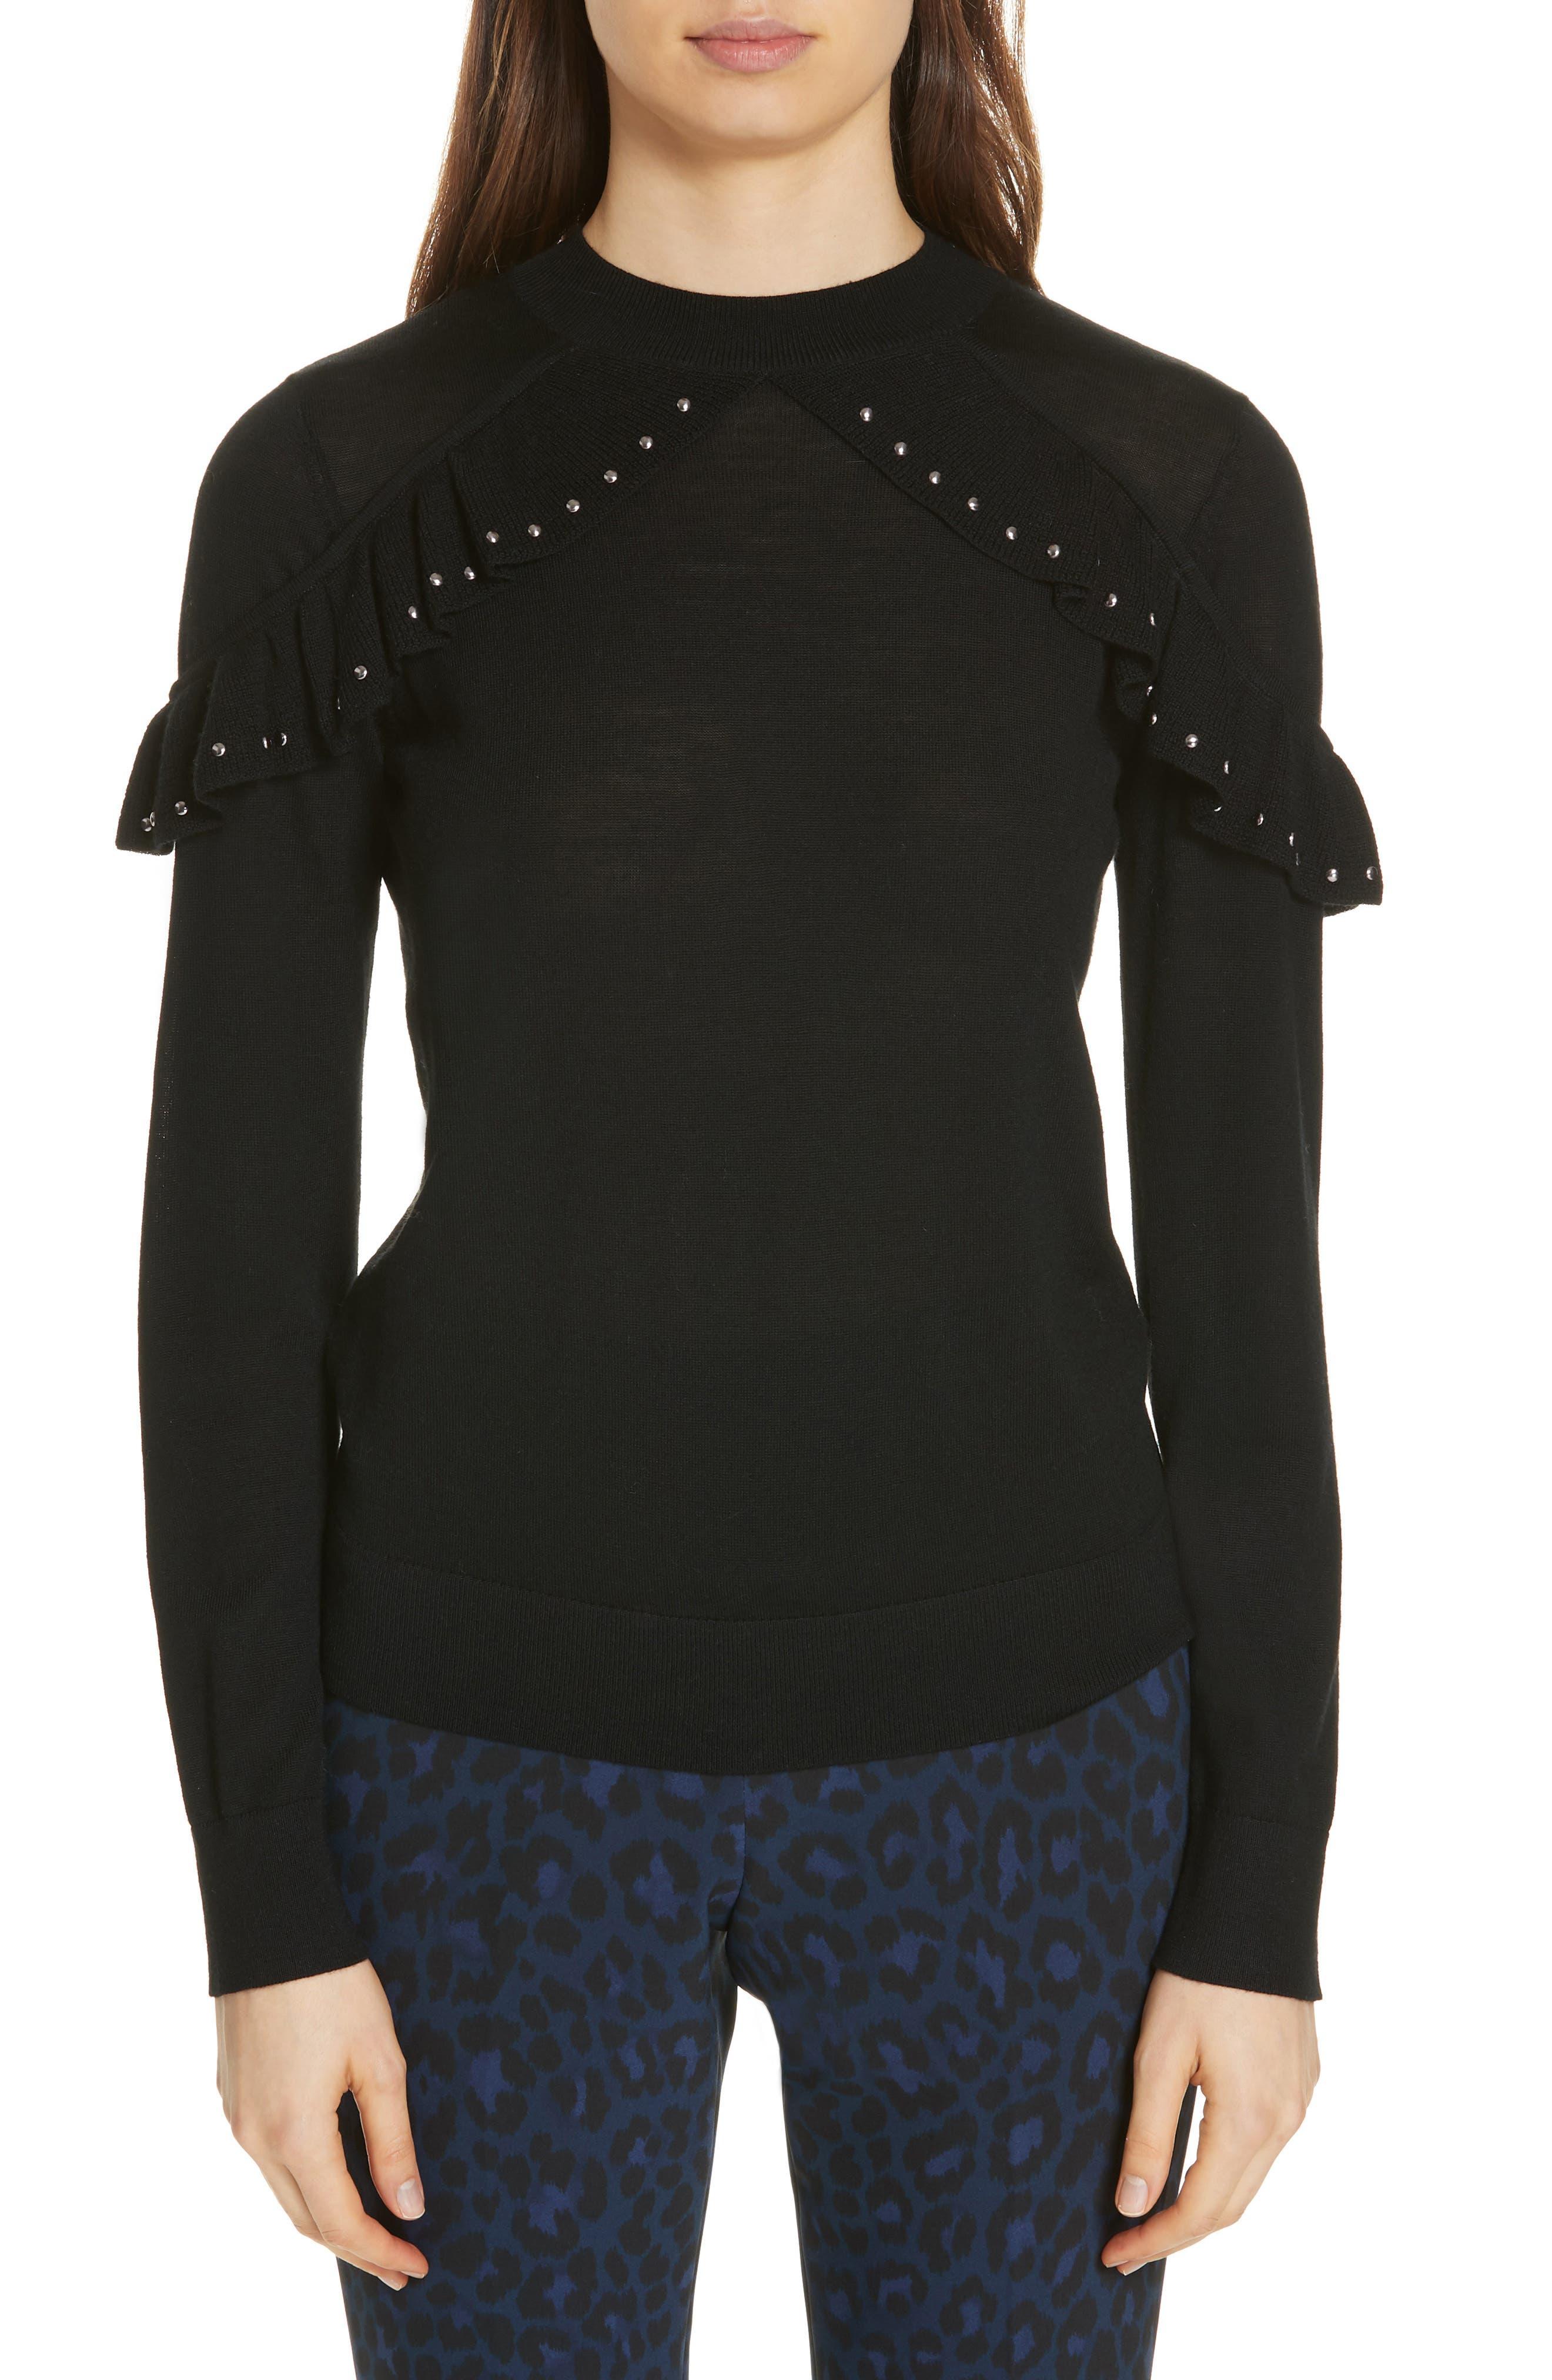 Kate Spade New York Studded Ruffle Sweater, Black